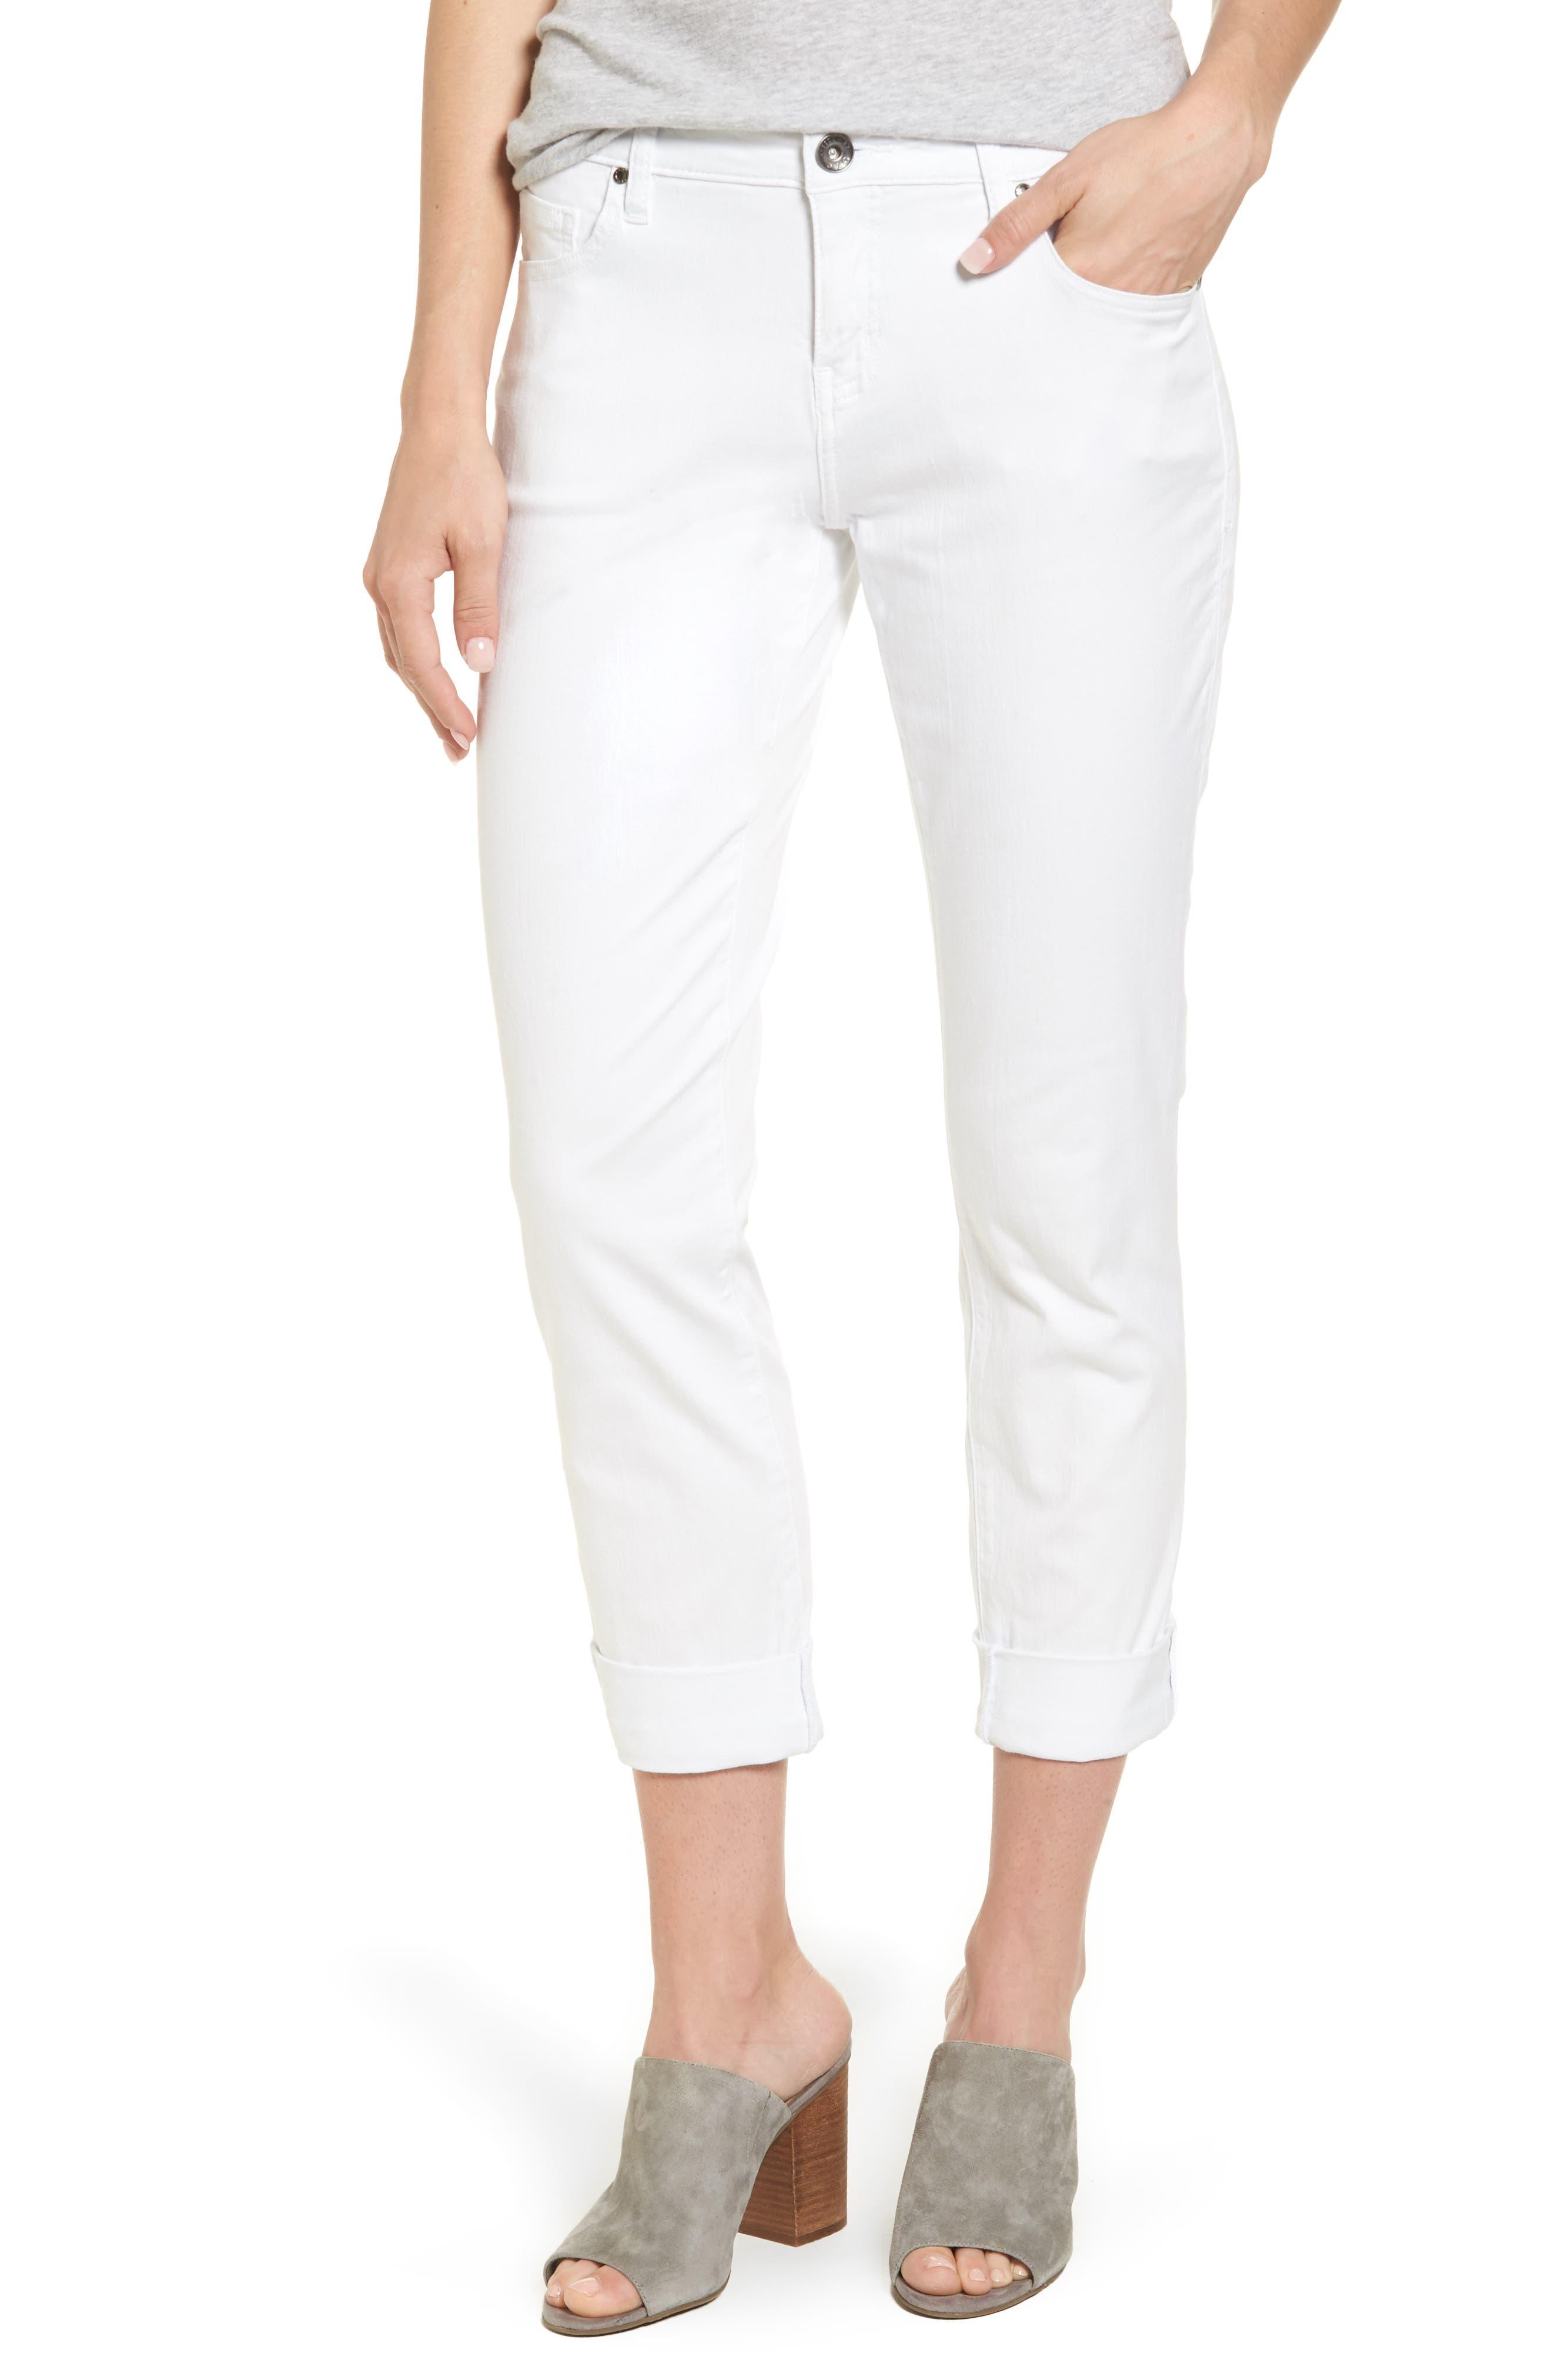 Jag Jeans Carter Knit Denim Girlfriend Jeans